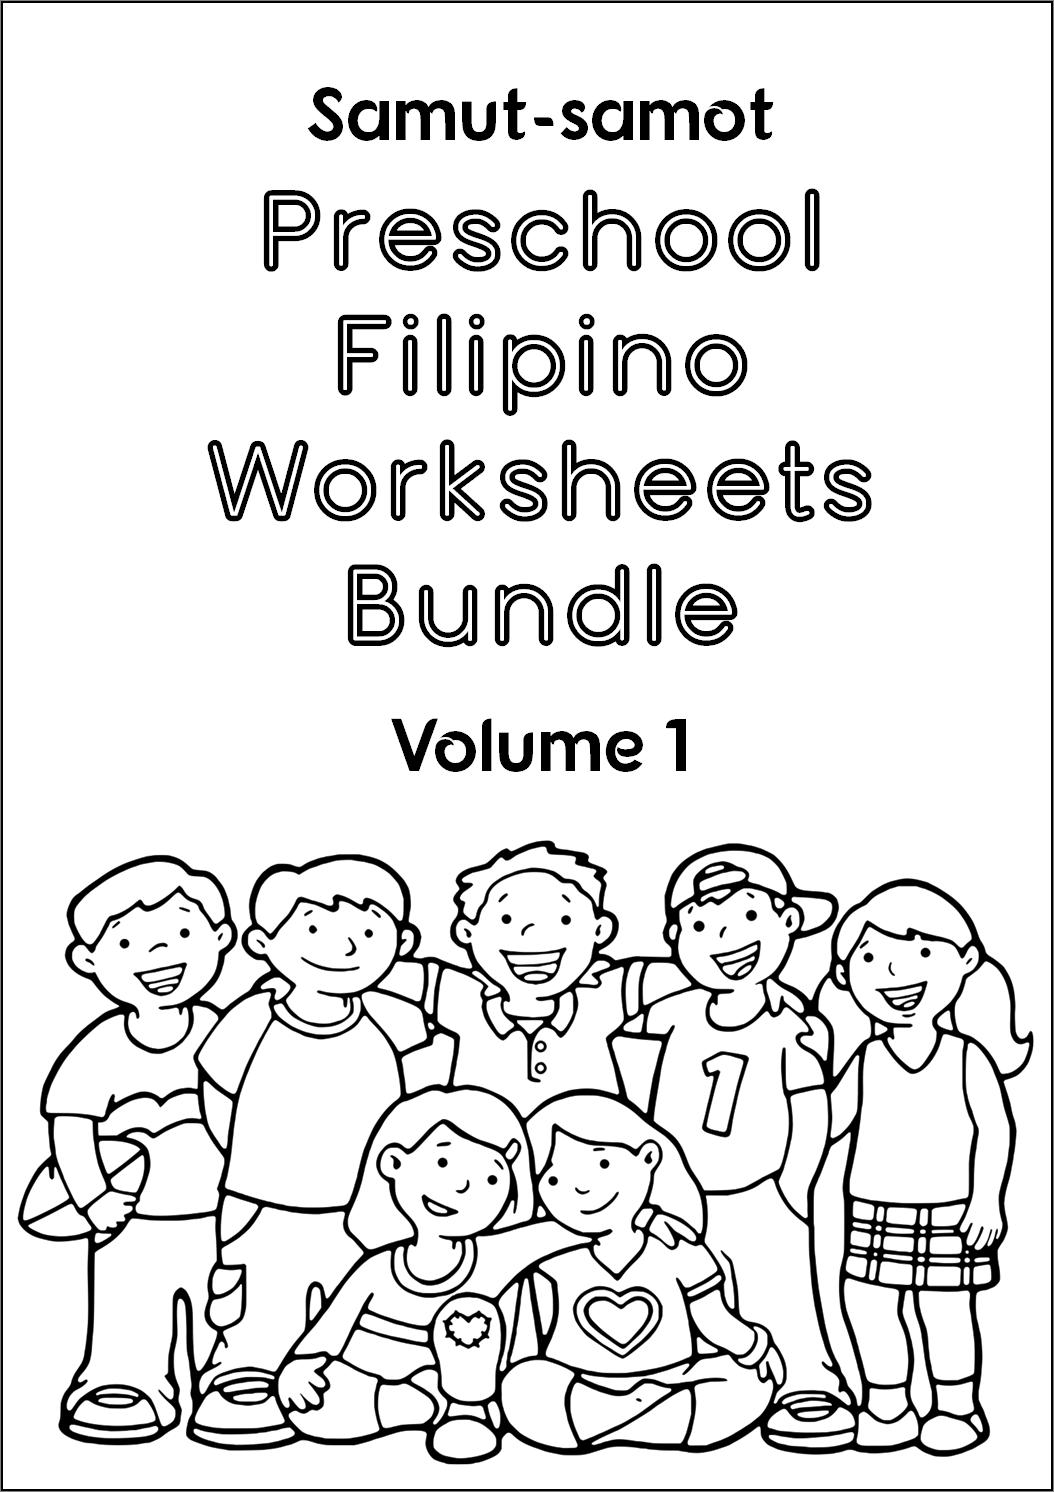 Preschool Filipino Worksheets Bundle Vol 1